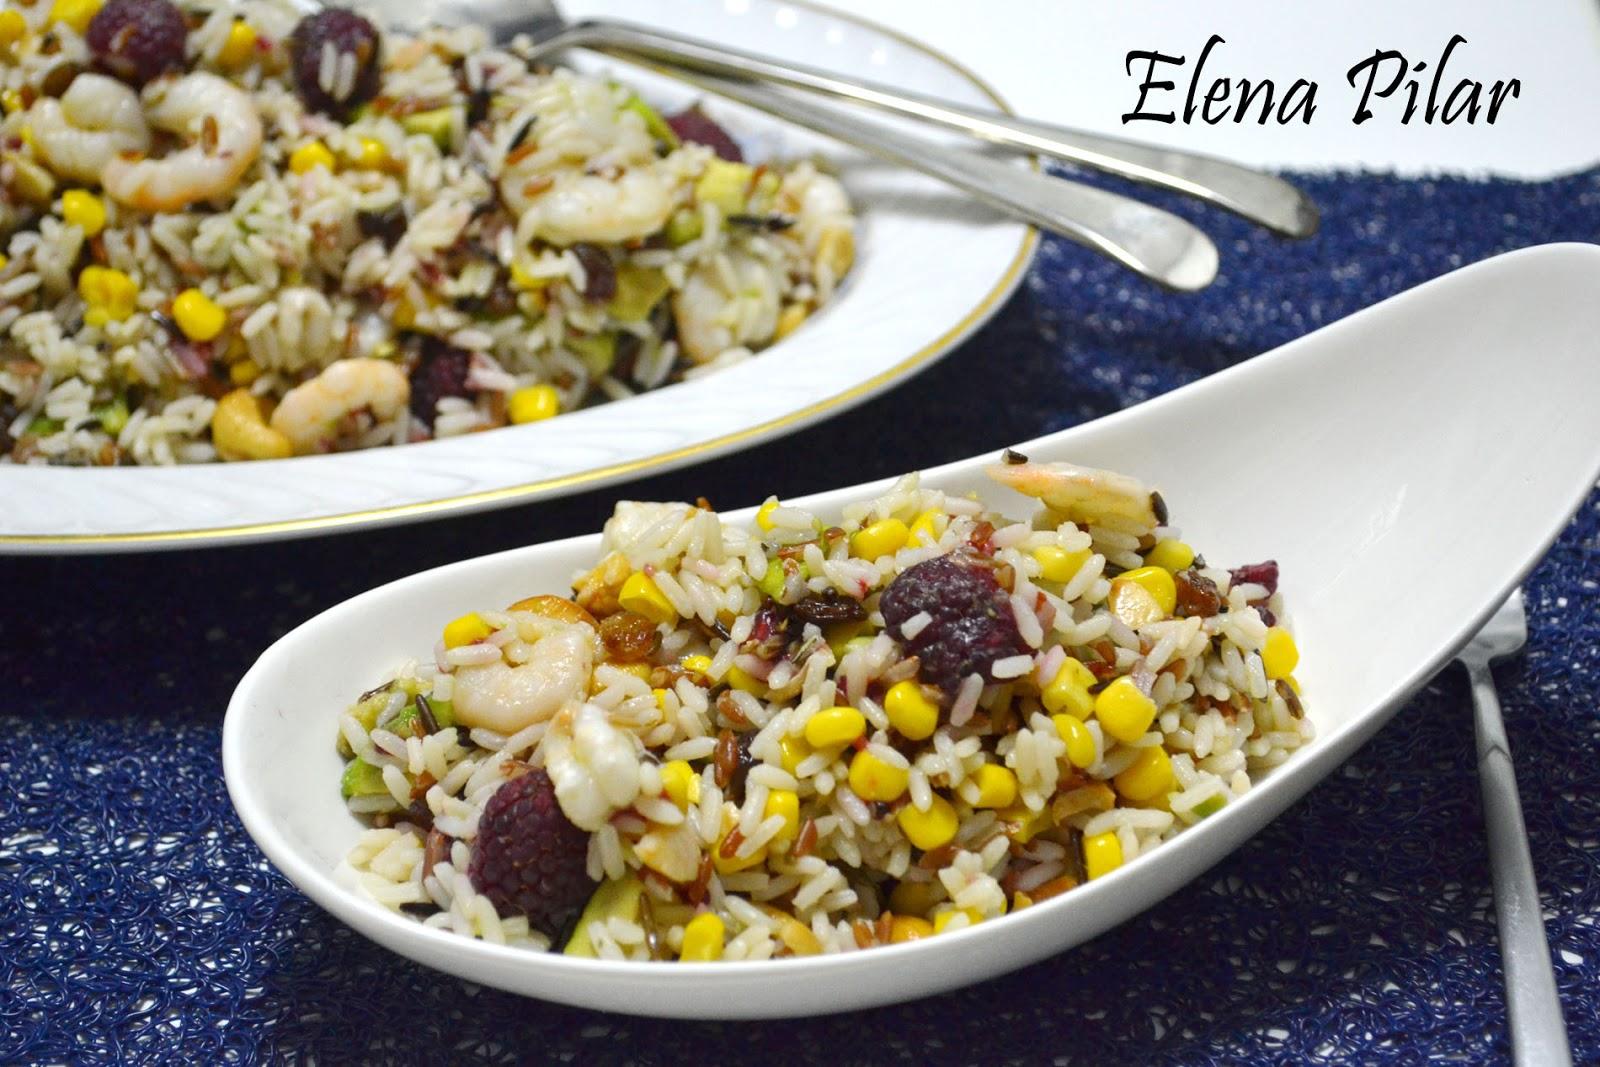 Mi recetario por elena pilar ensalada de arroz tricolor - Ensalada de arroz light ...